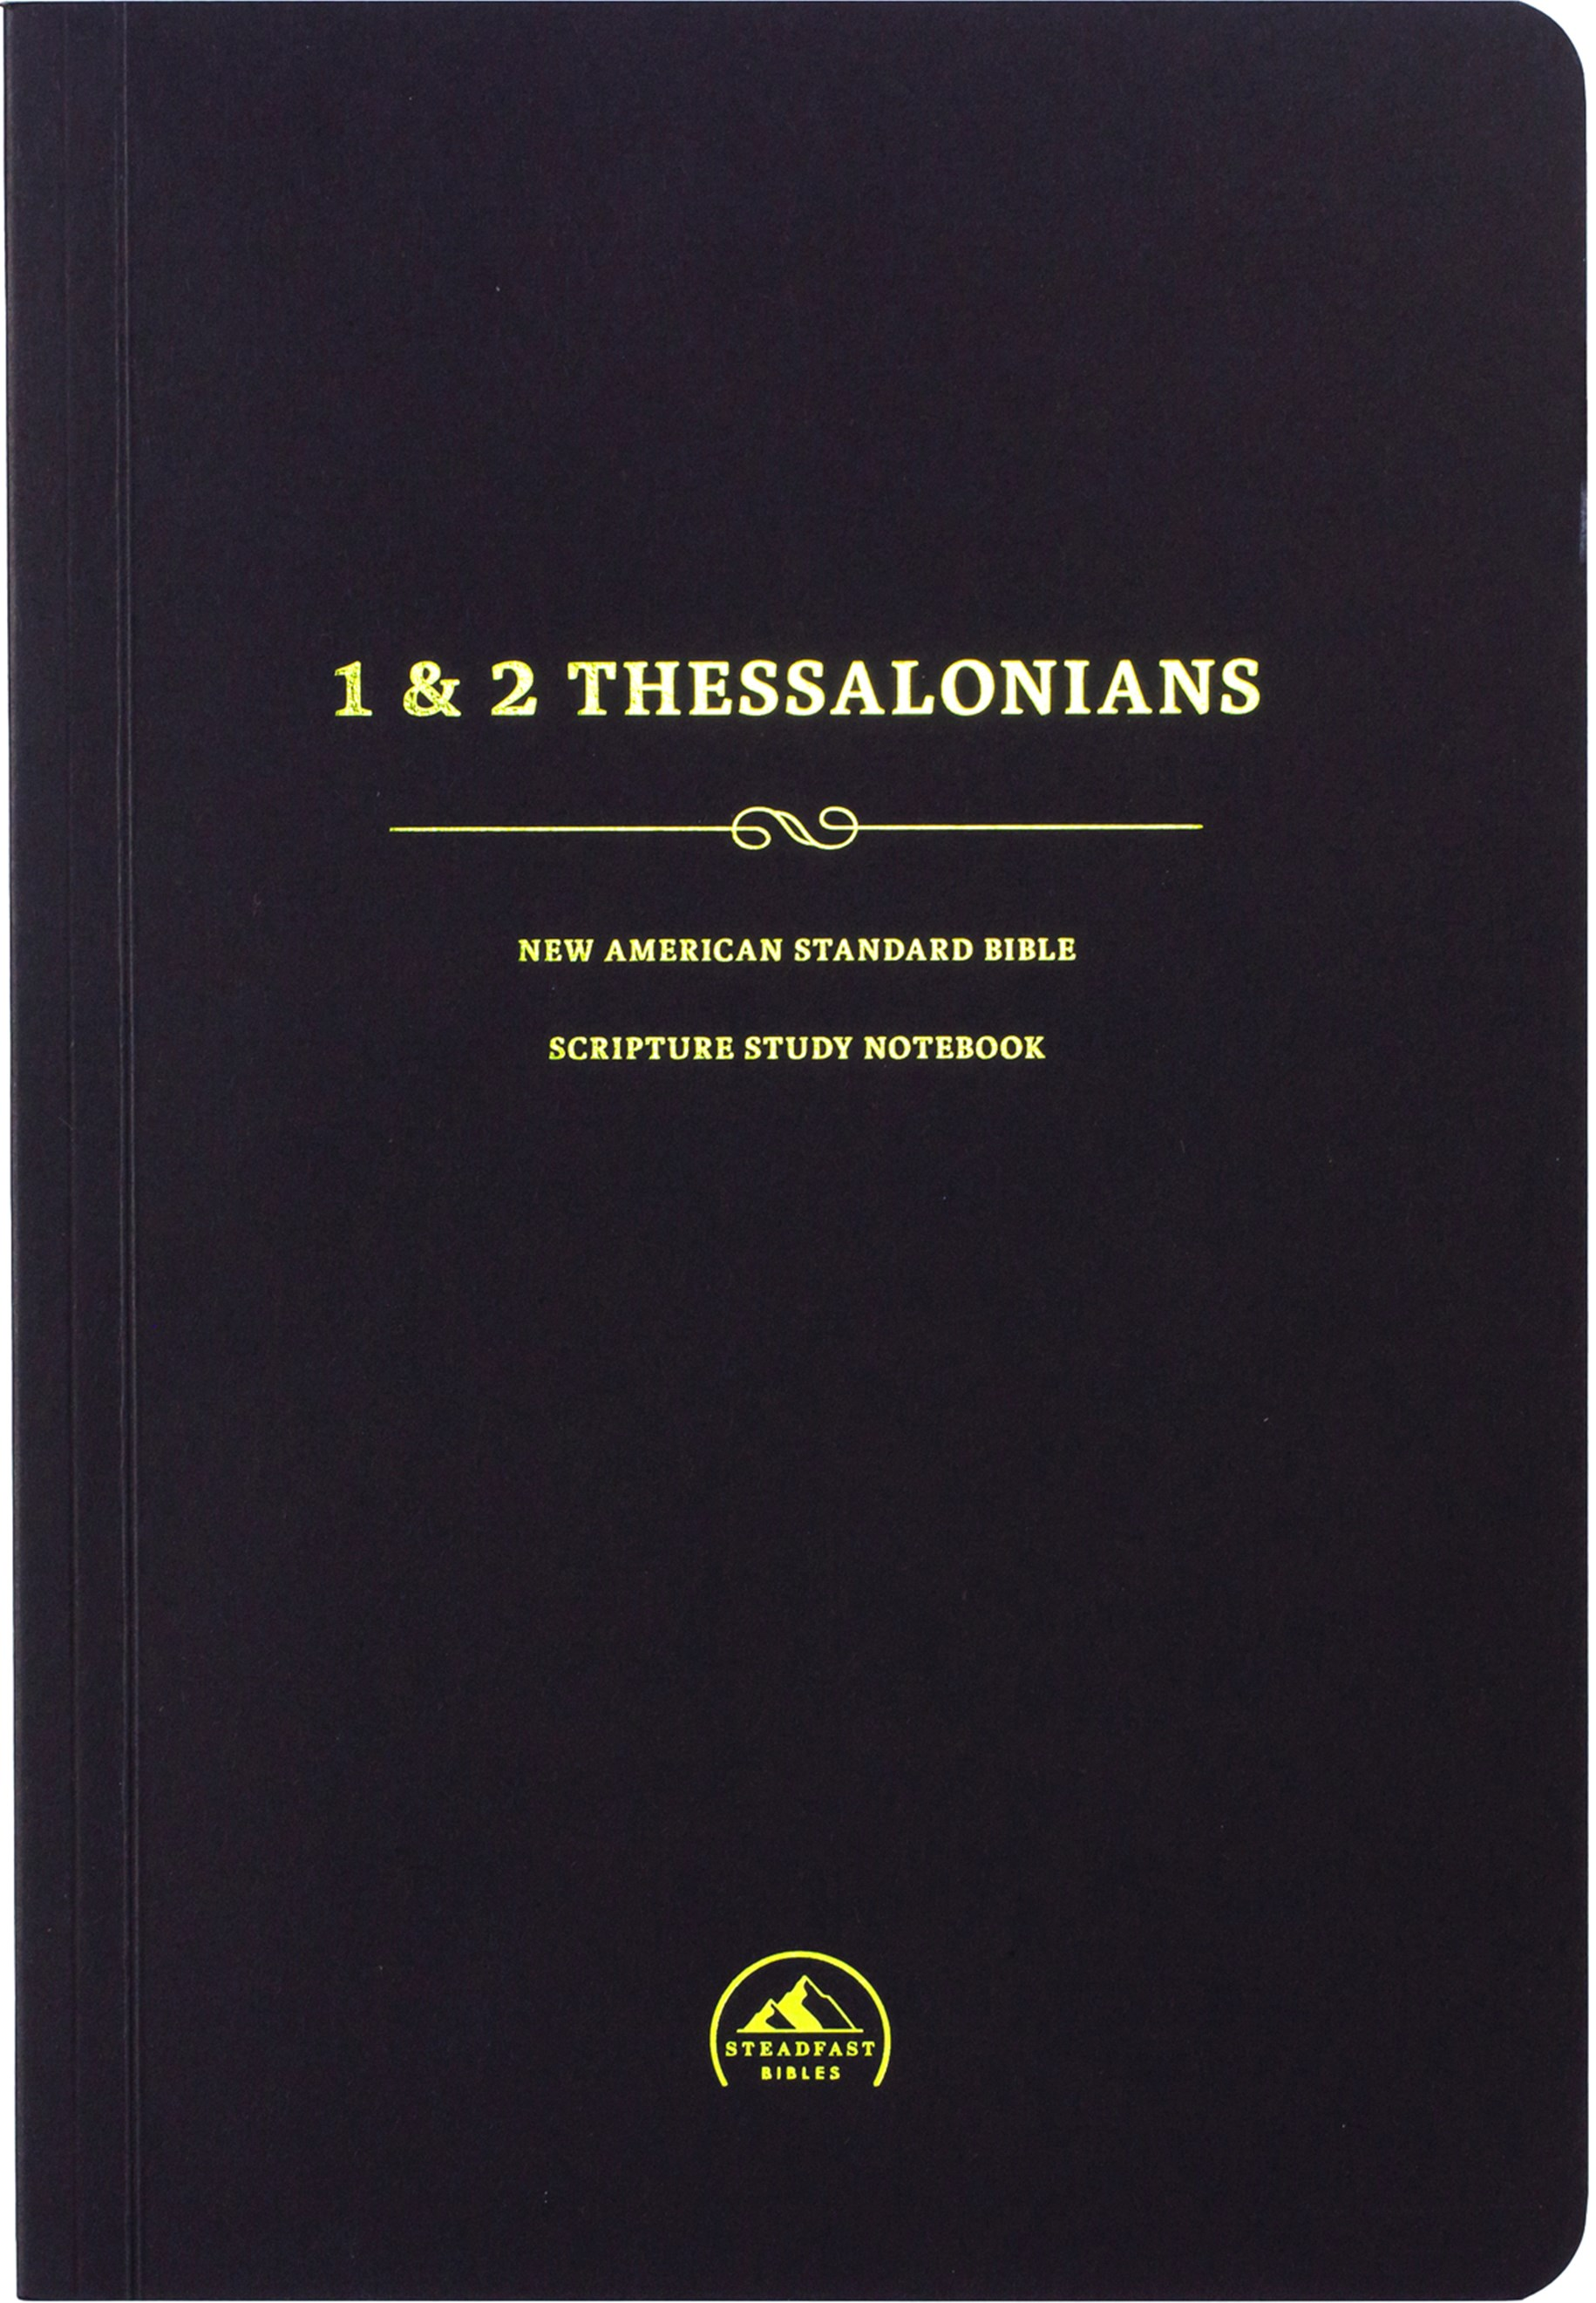 NASB Scripture Study Notebook: 1-2 Thessalonians